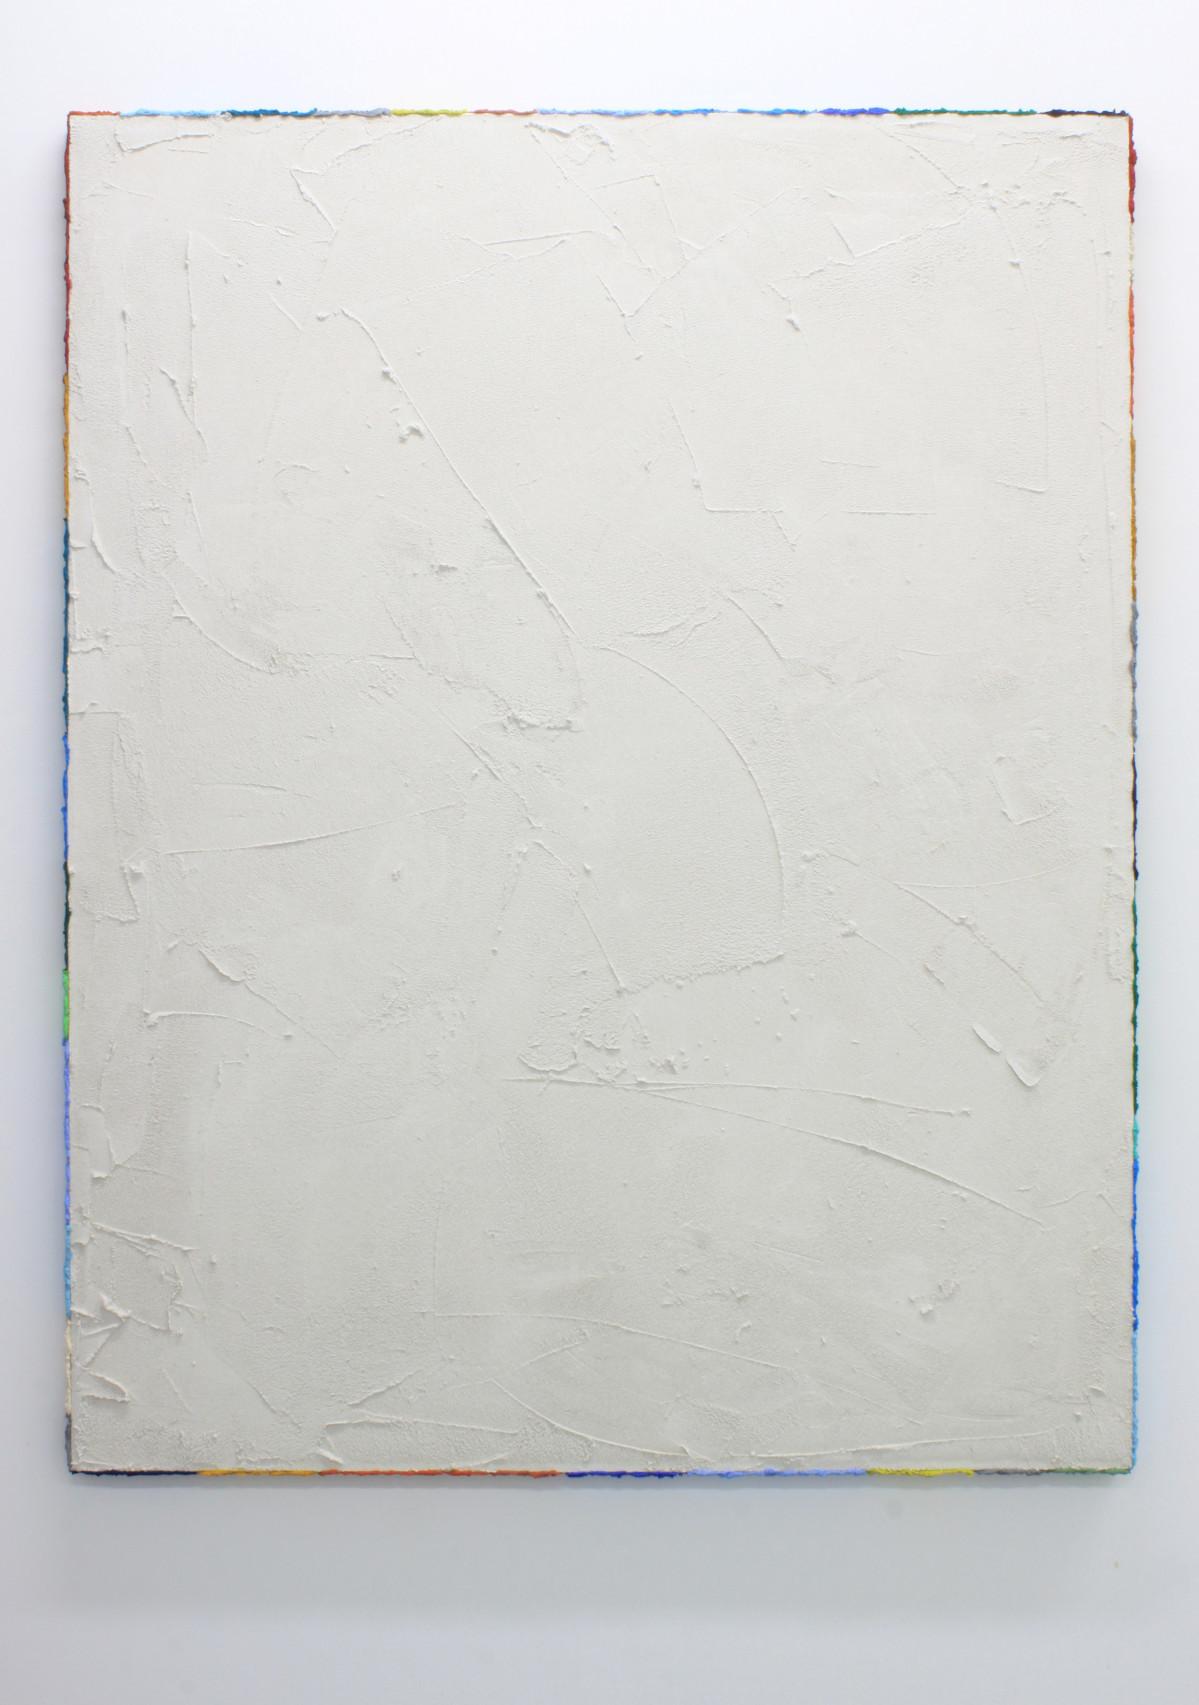 PR20, 2020. Acrylic, sand and limestone on linen. 163 x 131 cm.